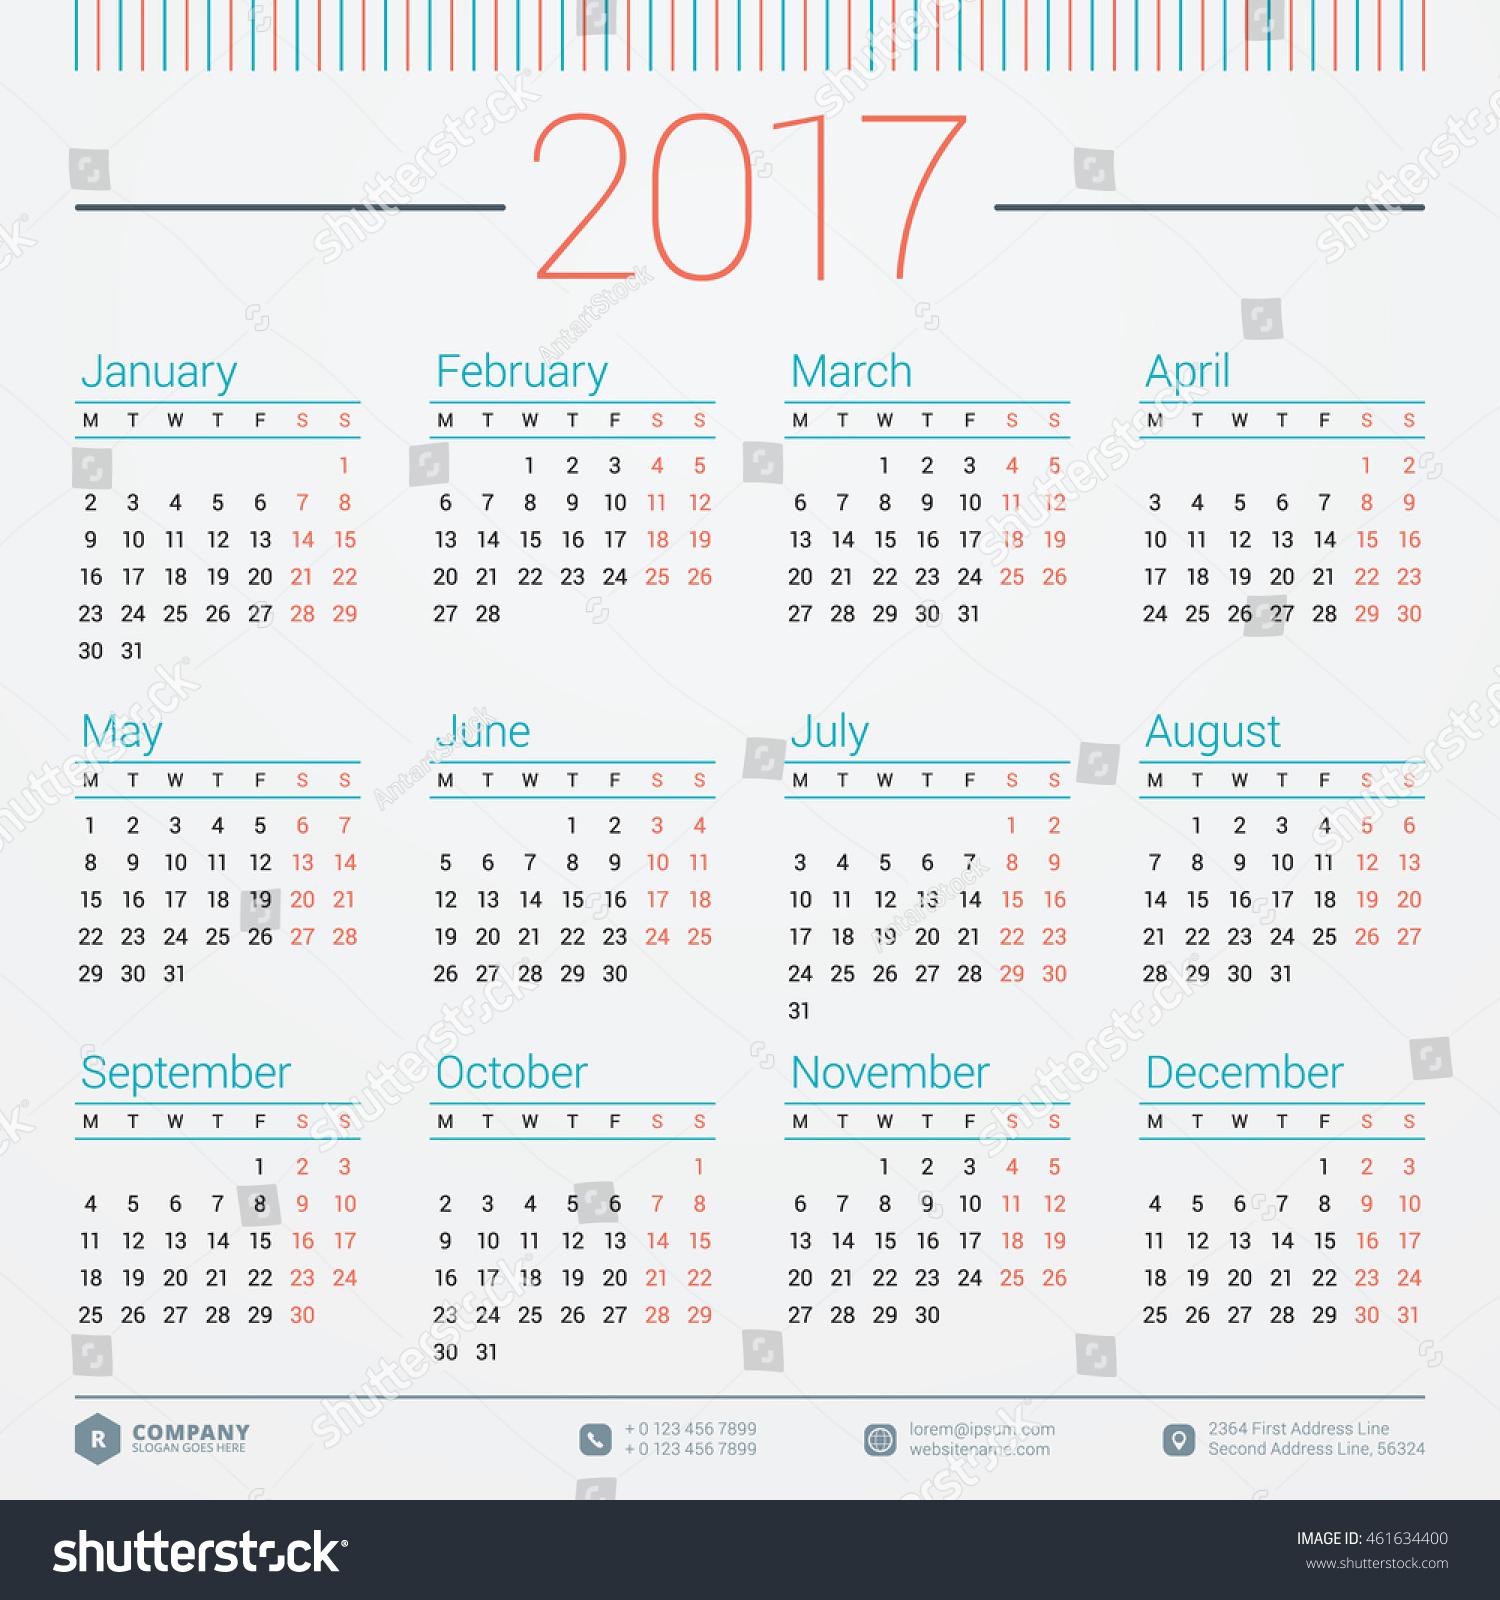 Year Calendar Vector : Calendar year vector design stationery stock